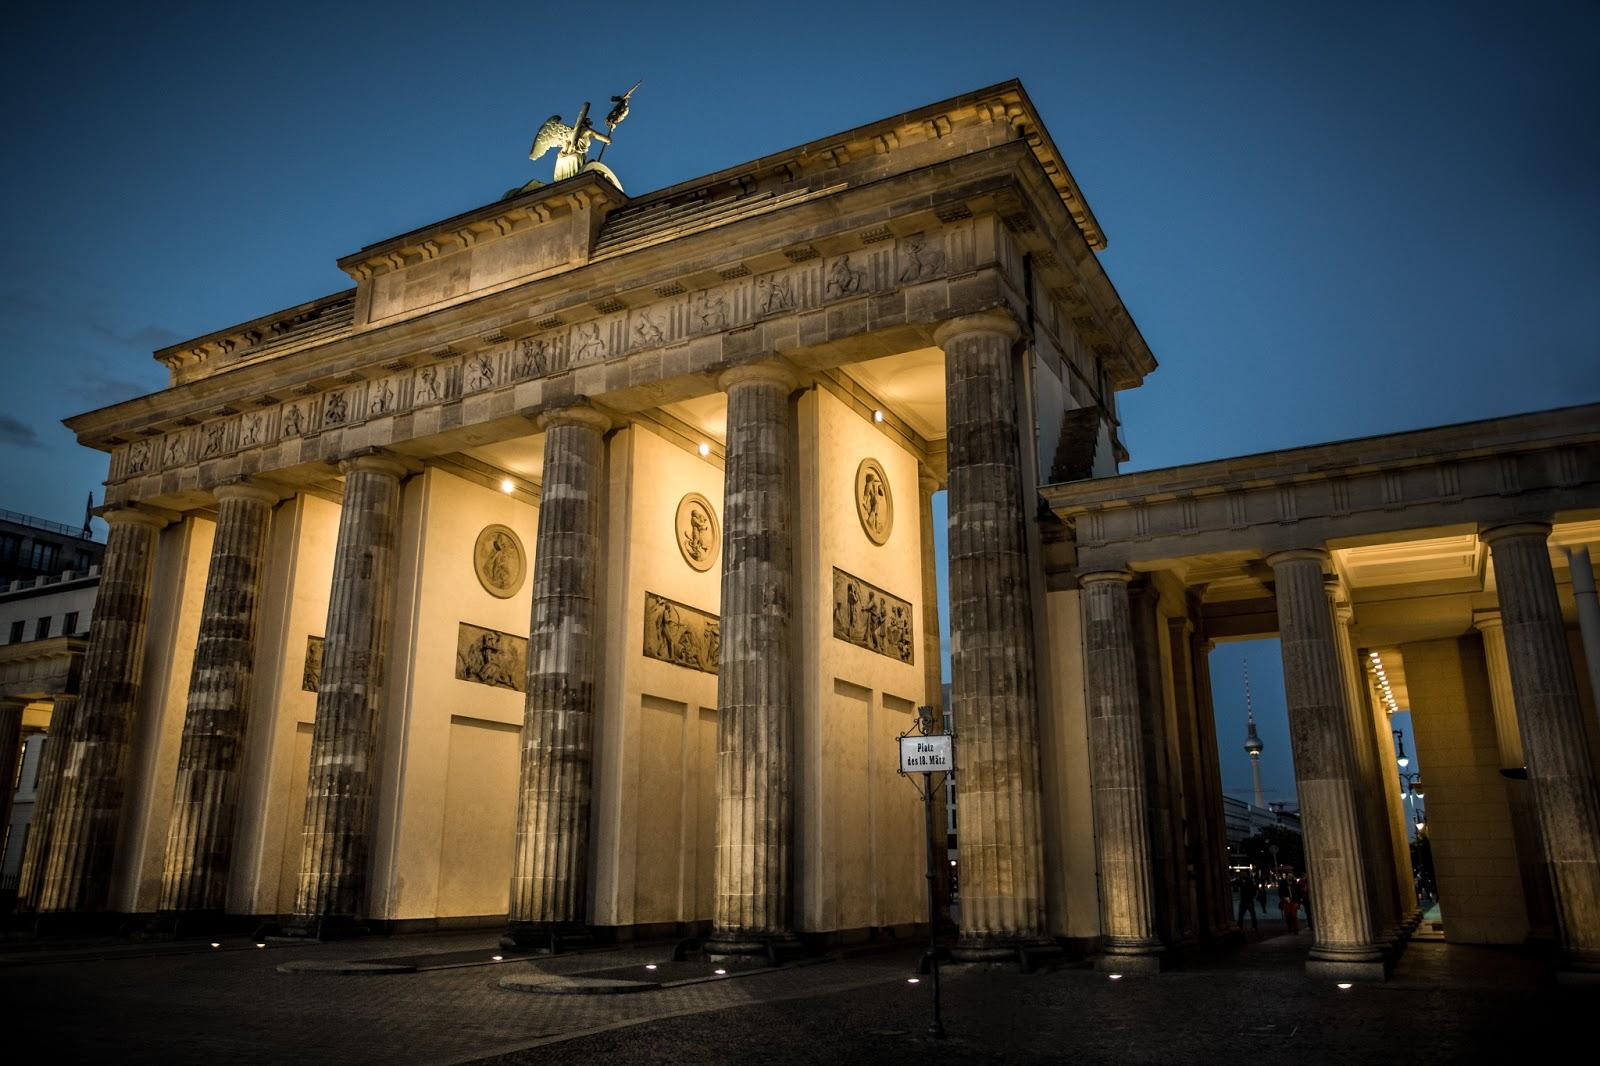 Brandeburgo :: Canon EOS5D MkIII | ISO1600 | Canon17-40 @27mm | f/4.0 | 1/80s